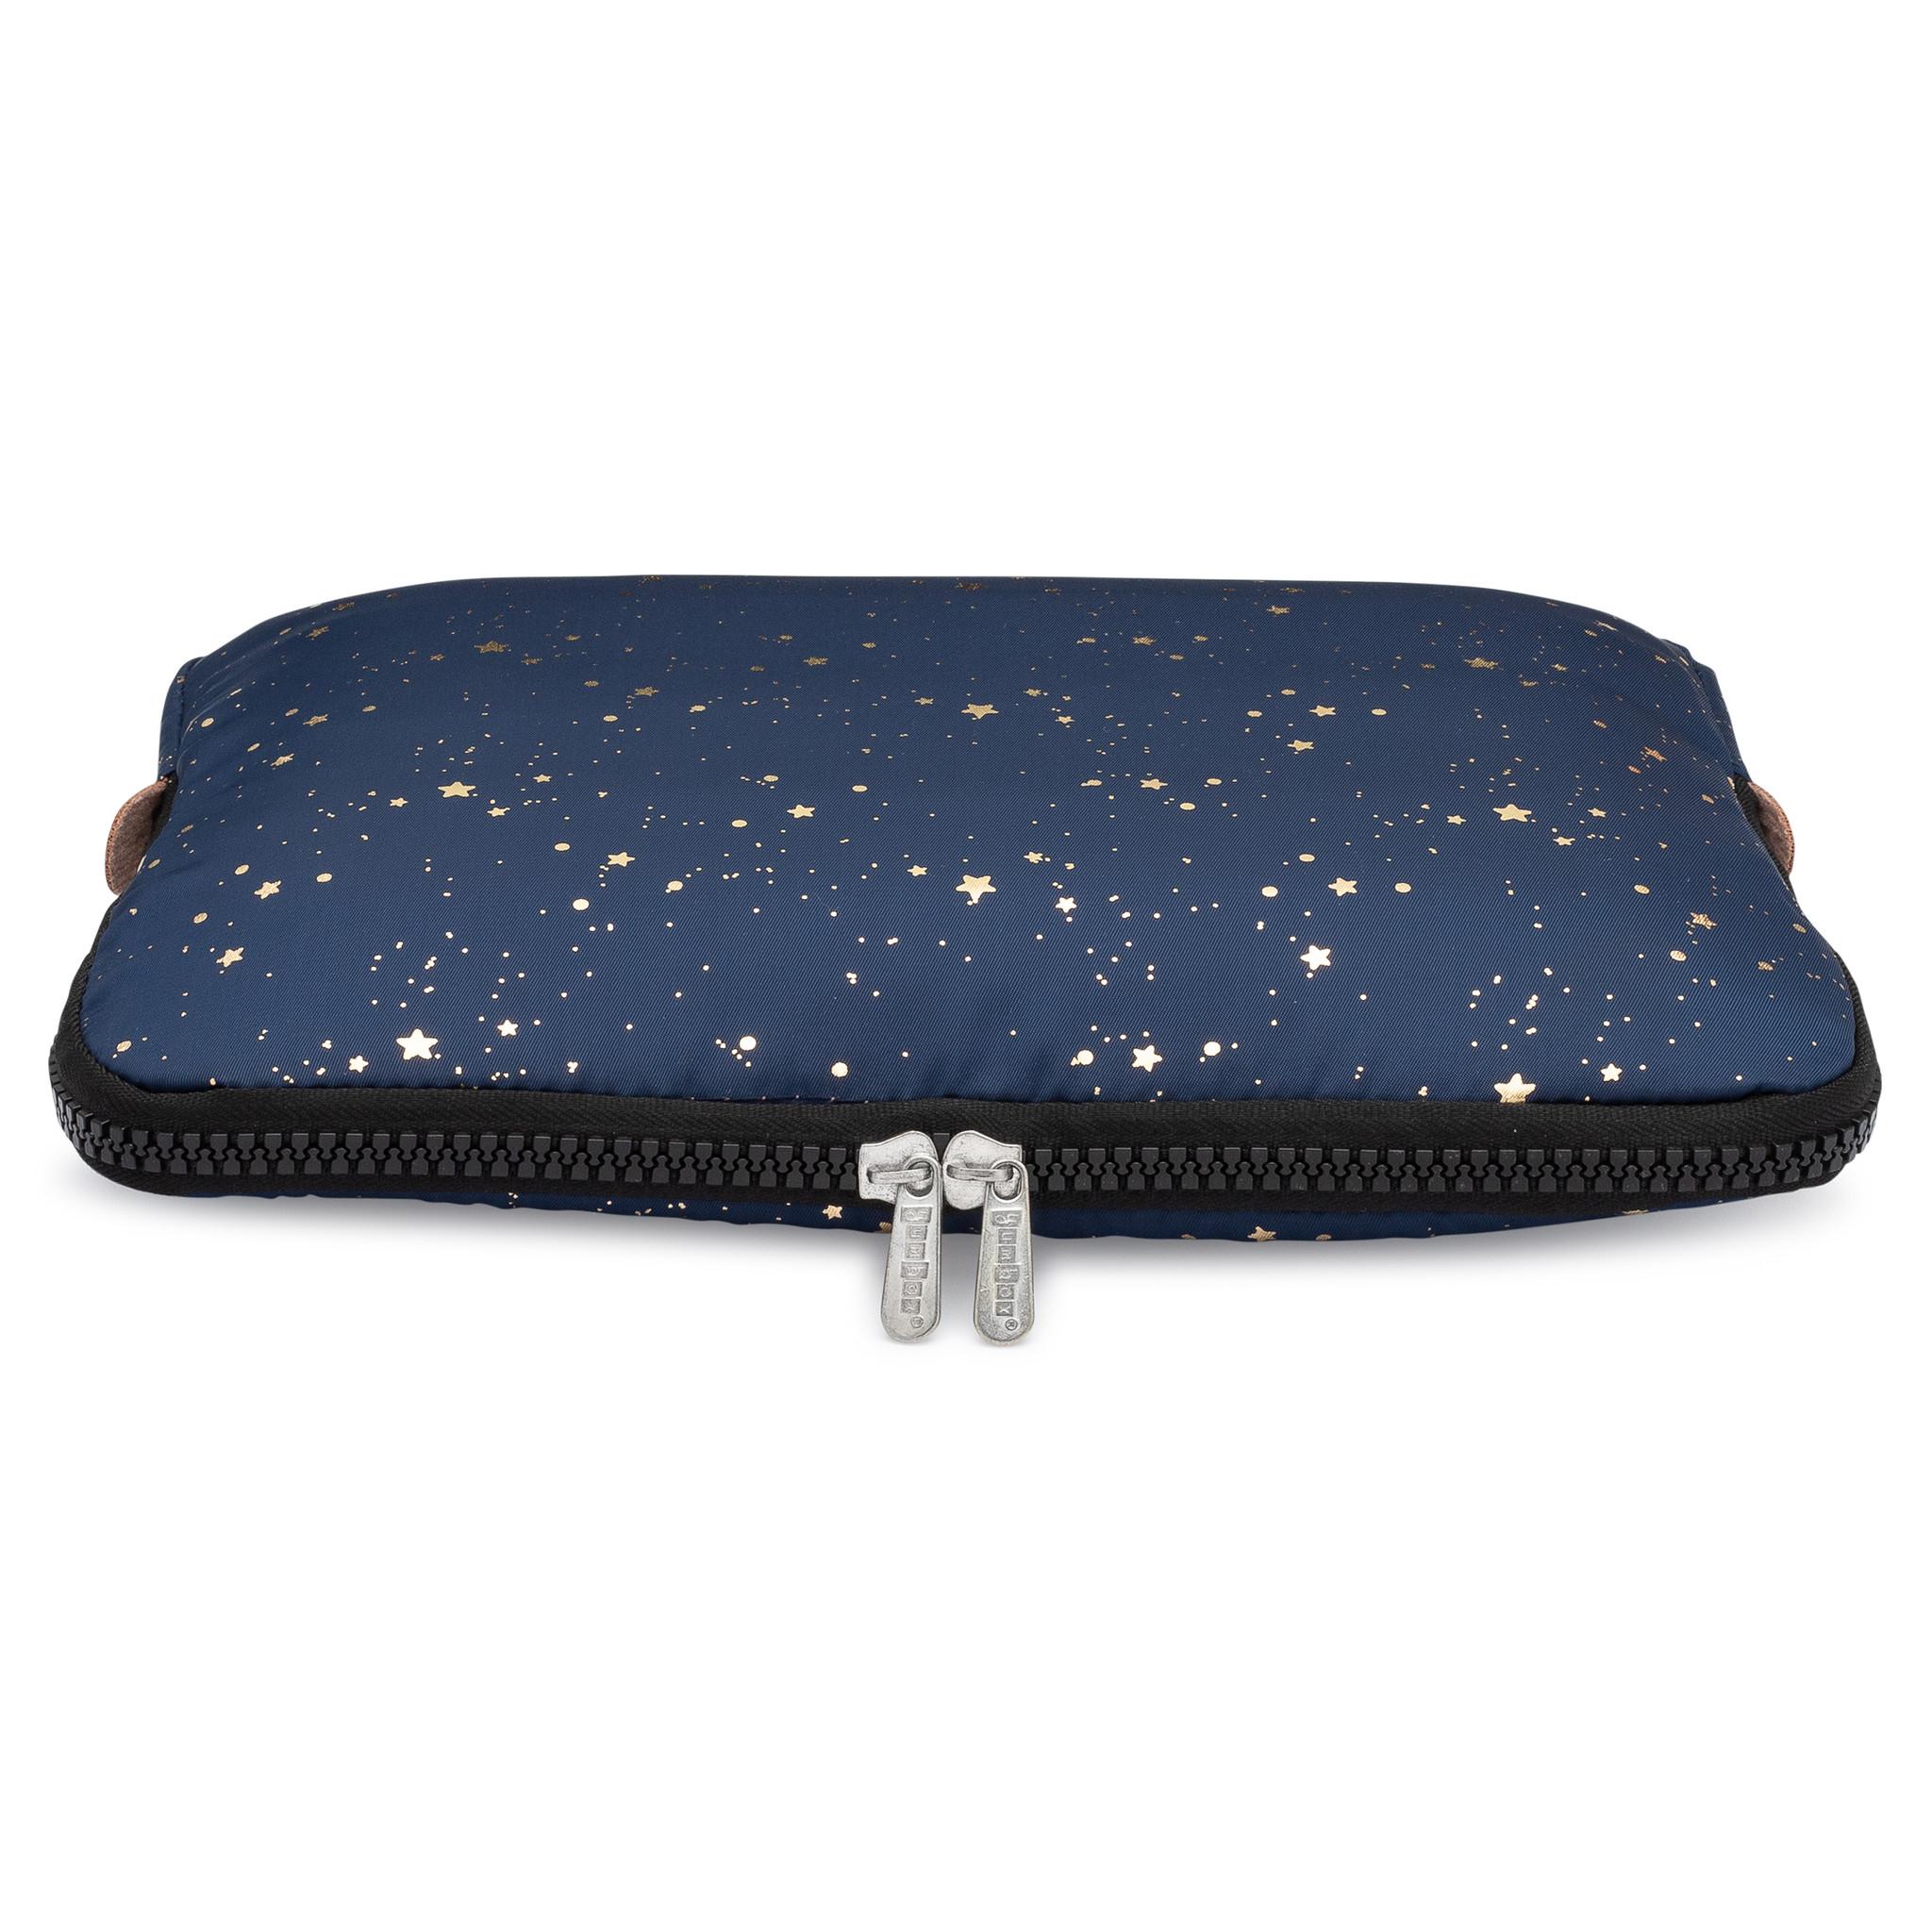 Yumbox Poche insulating sleeve Navy / Gold Stars-4